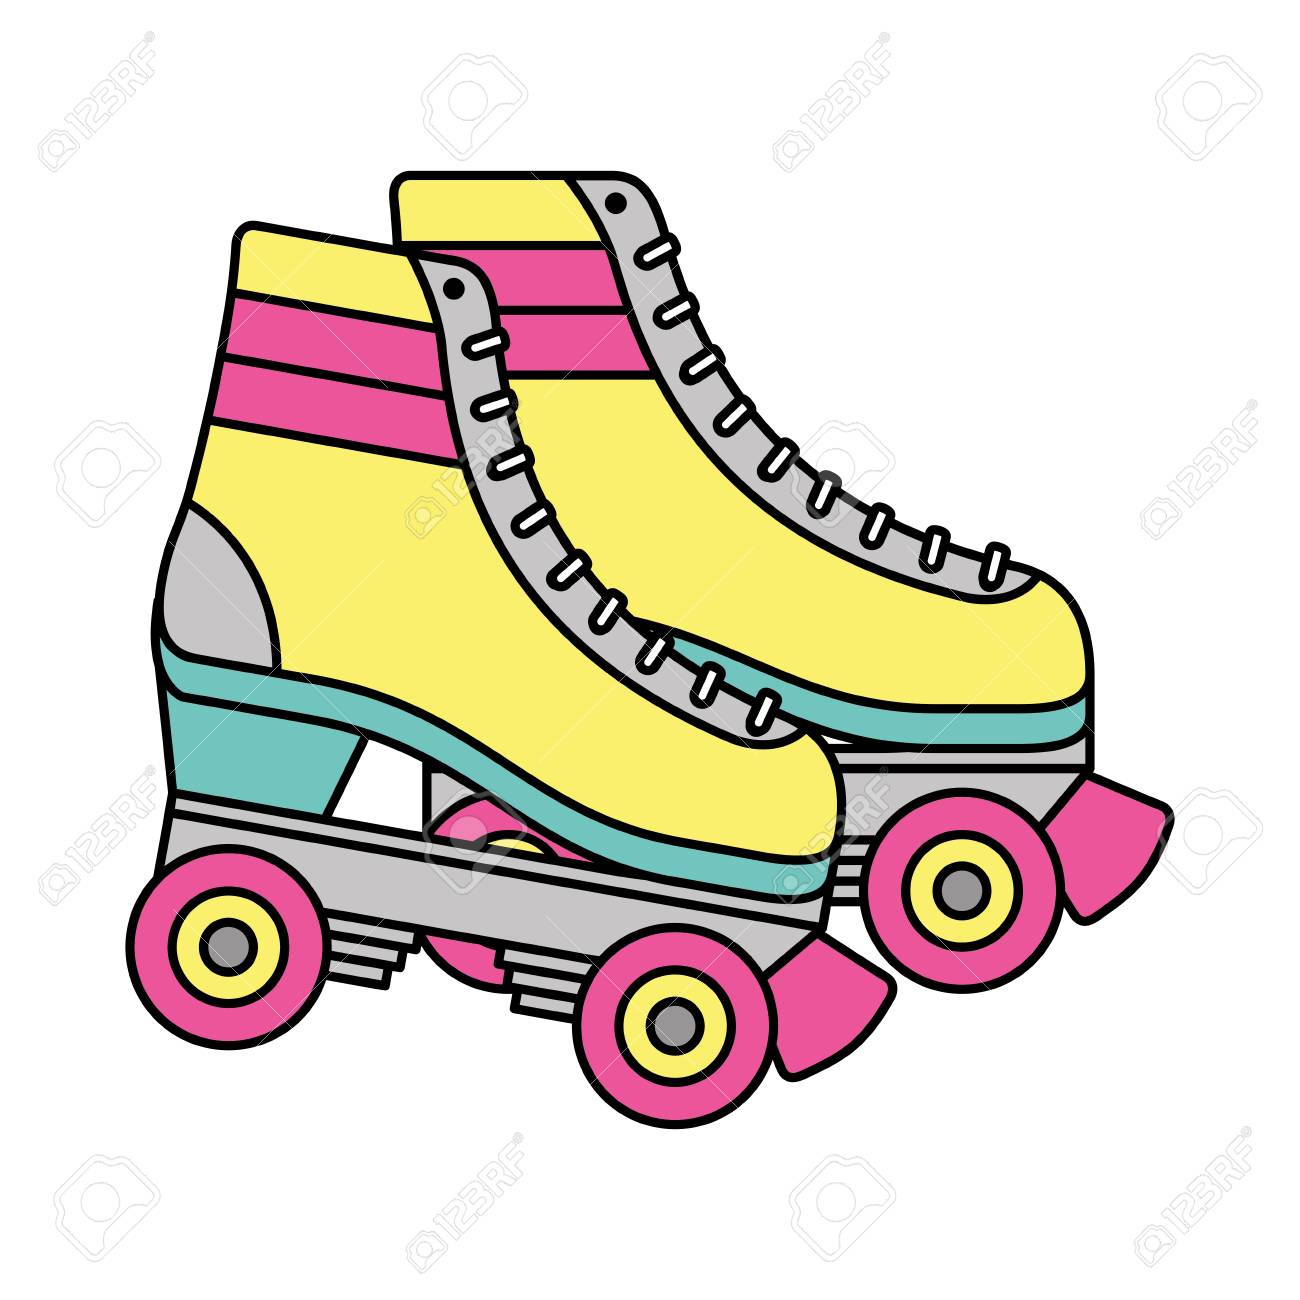 Retro roller skates wheels trendy vintage vector illustration.